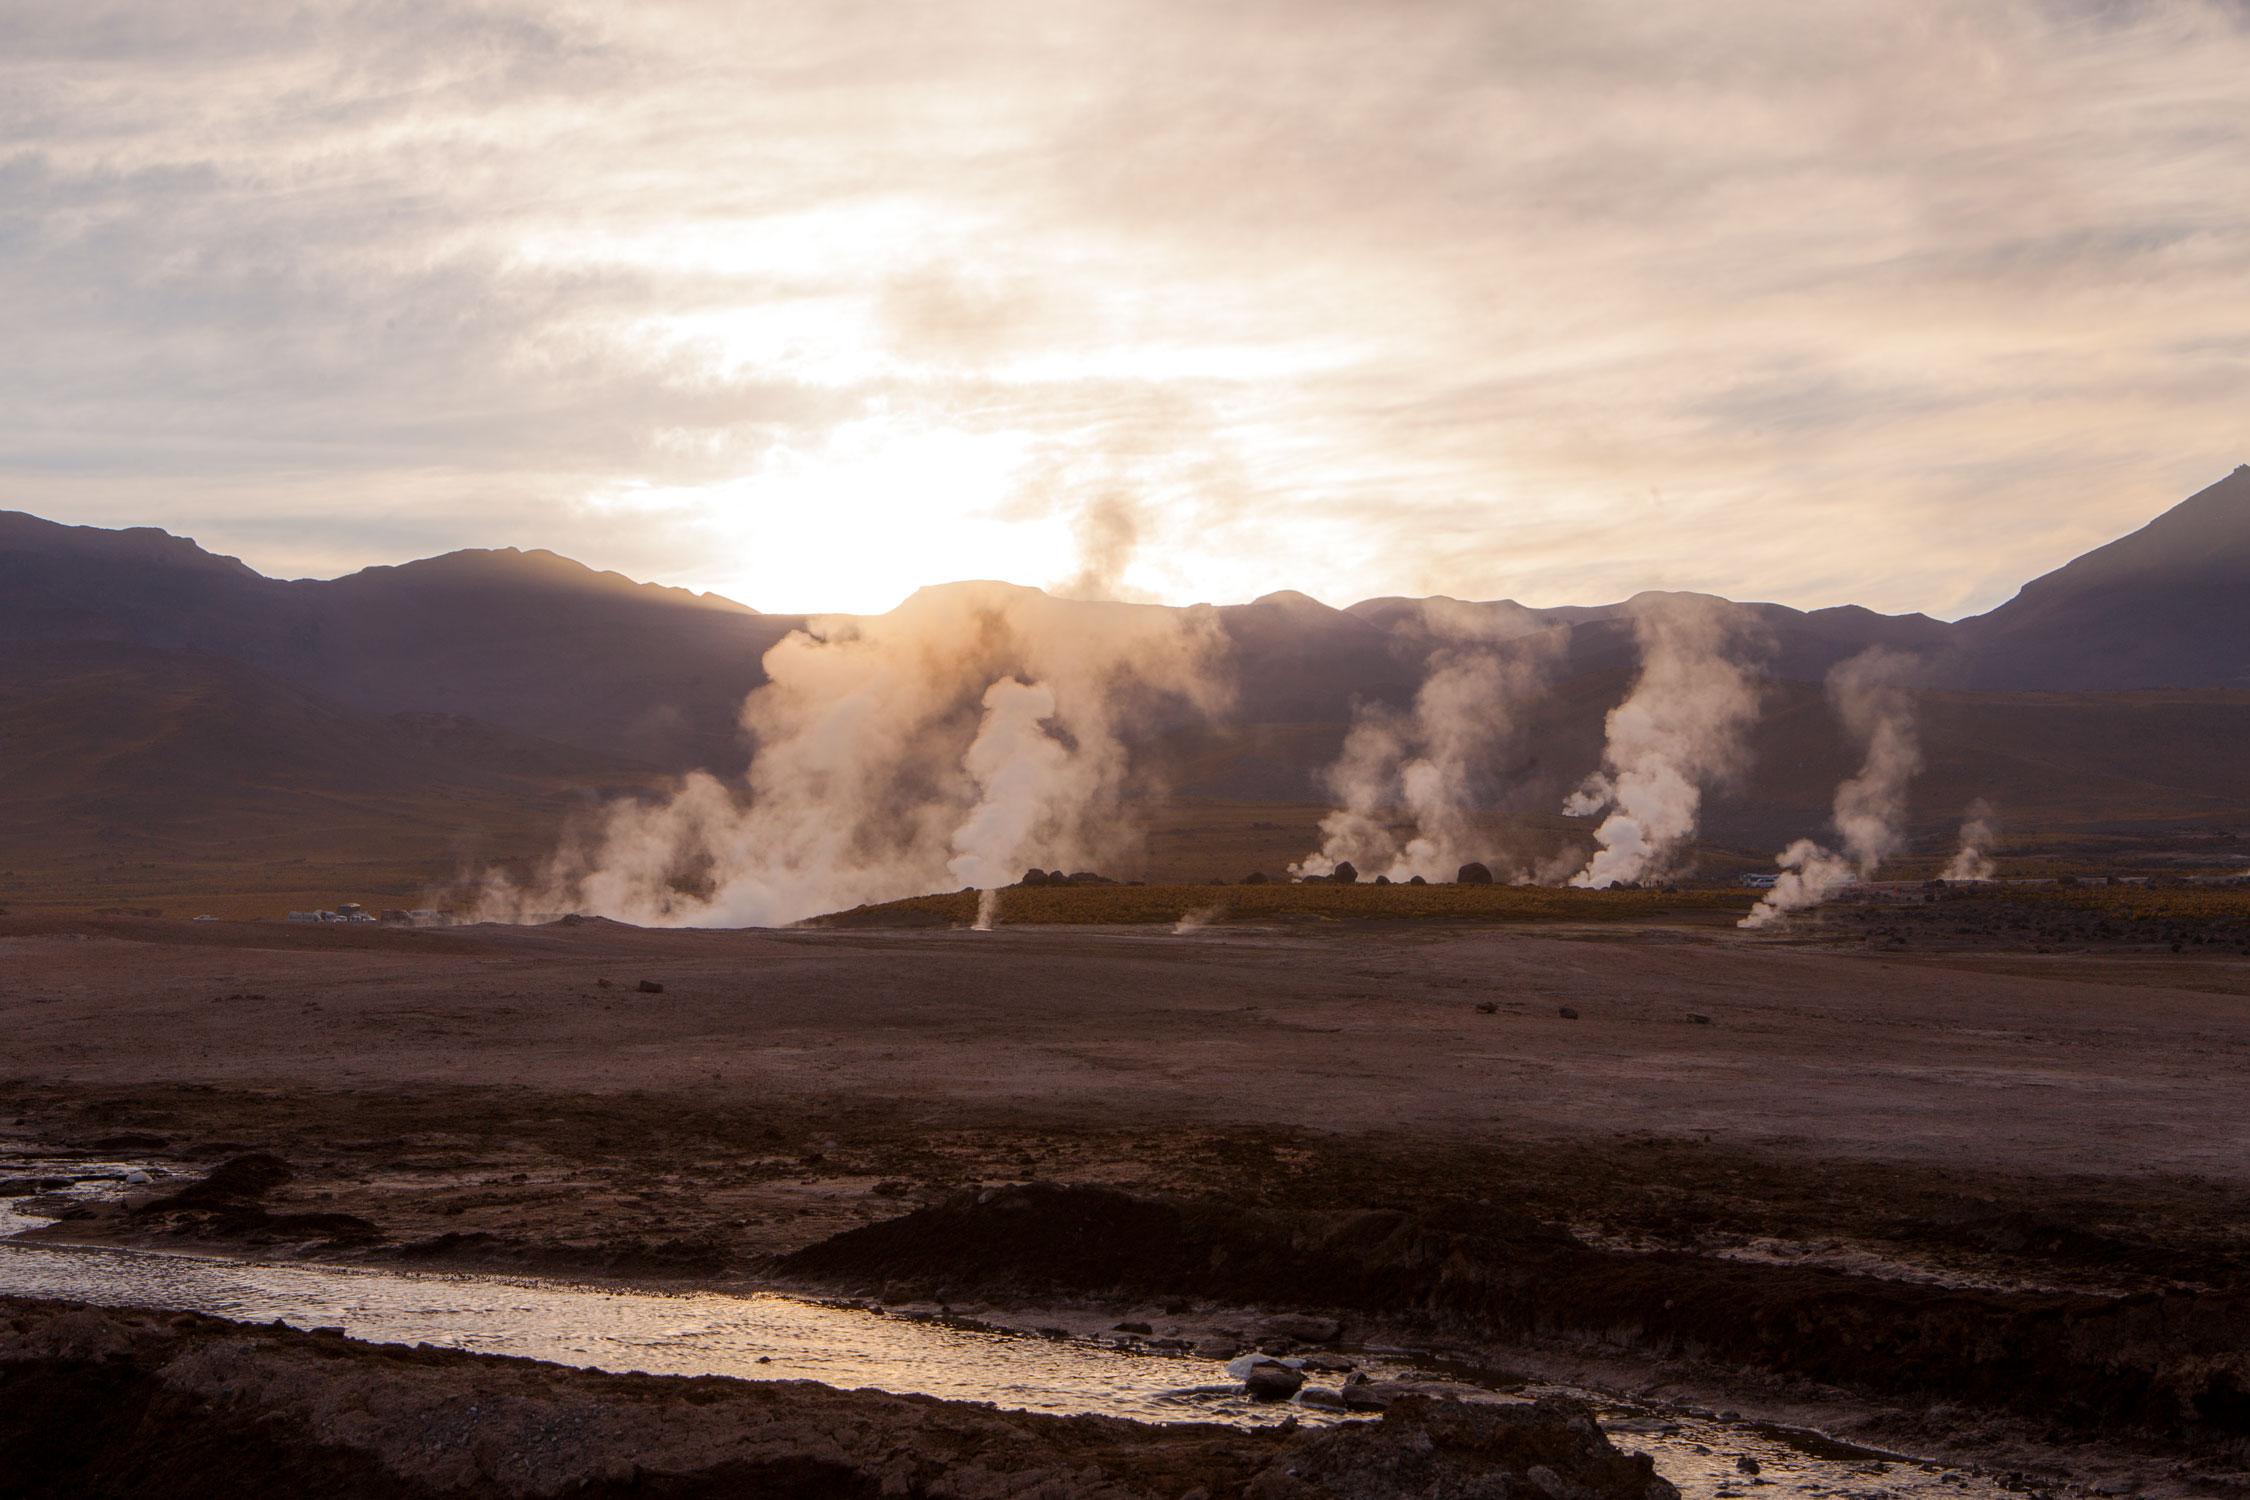 atacama-desert-chile-wander-south-el-tatio-geysers-1.jpg